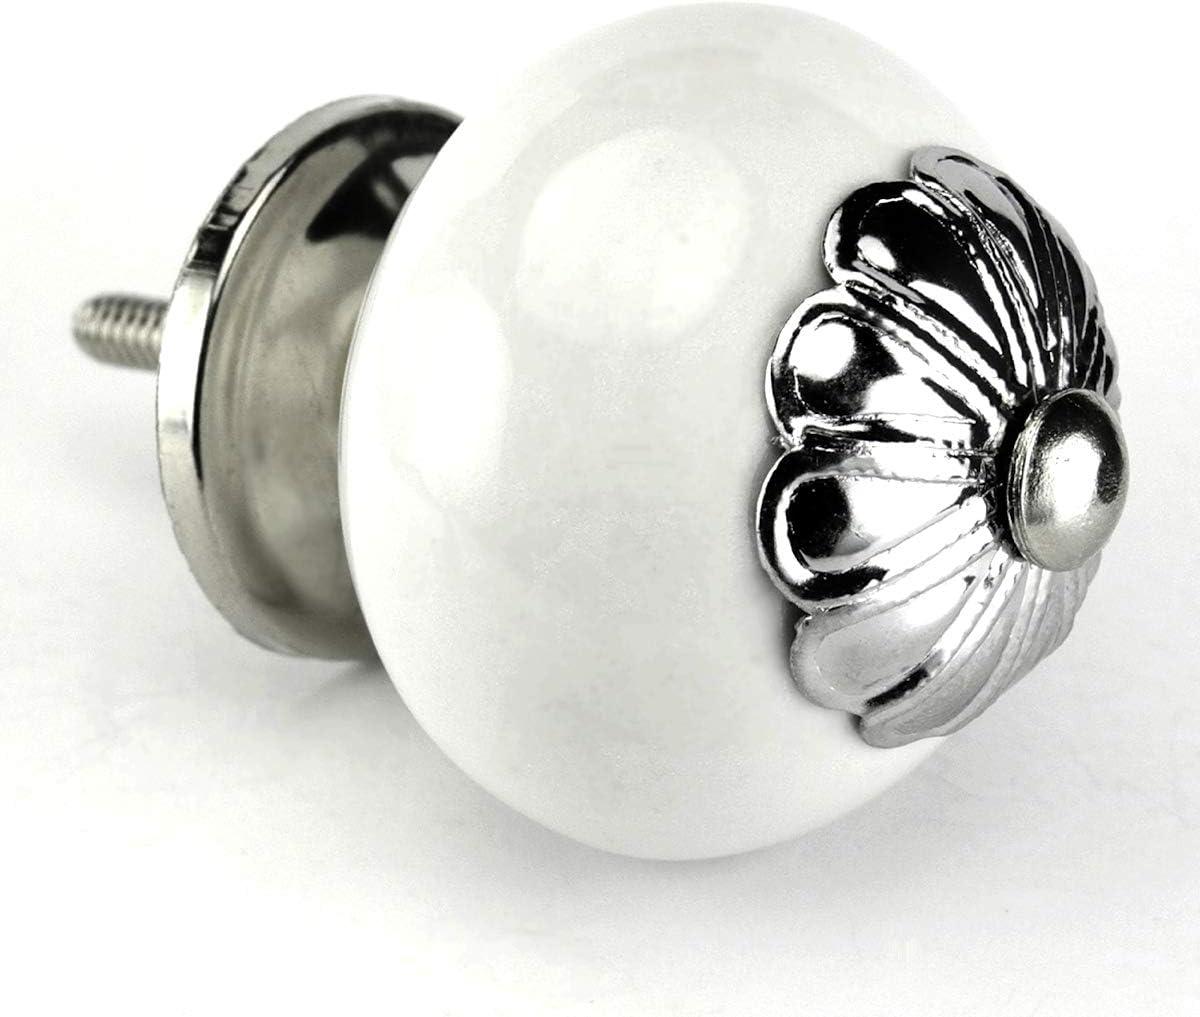 White trust Limited time trial price Ceramic Knobs 10pcs C110VM Kitchen Cupbo Furniture Dresser